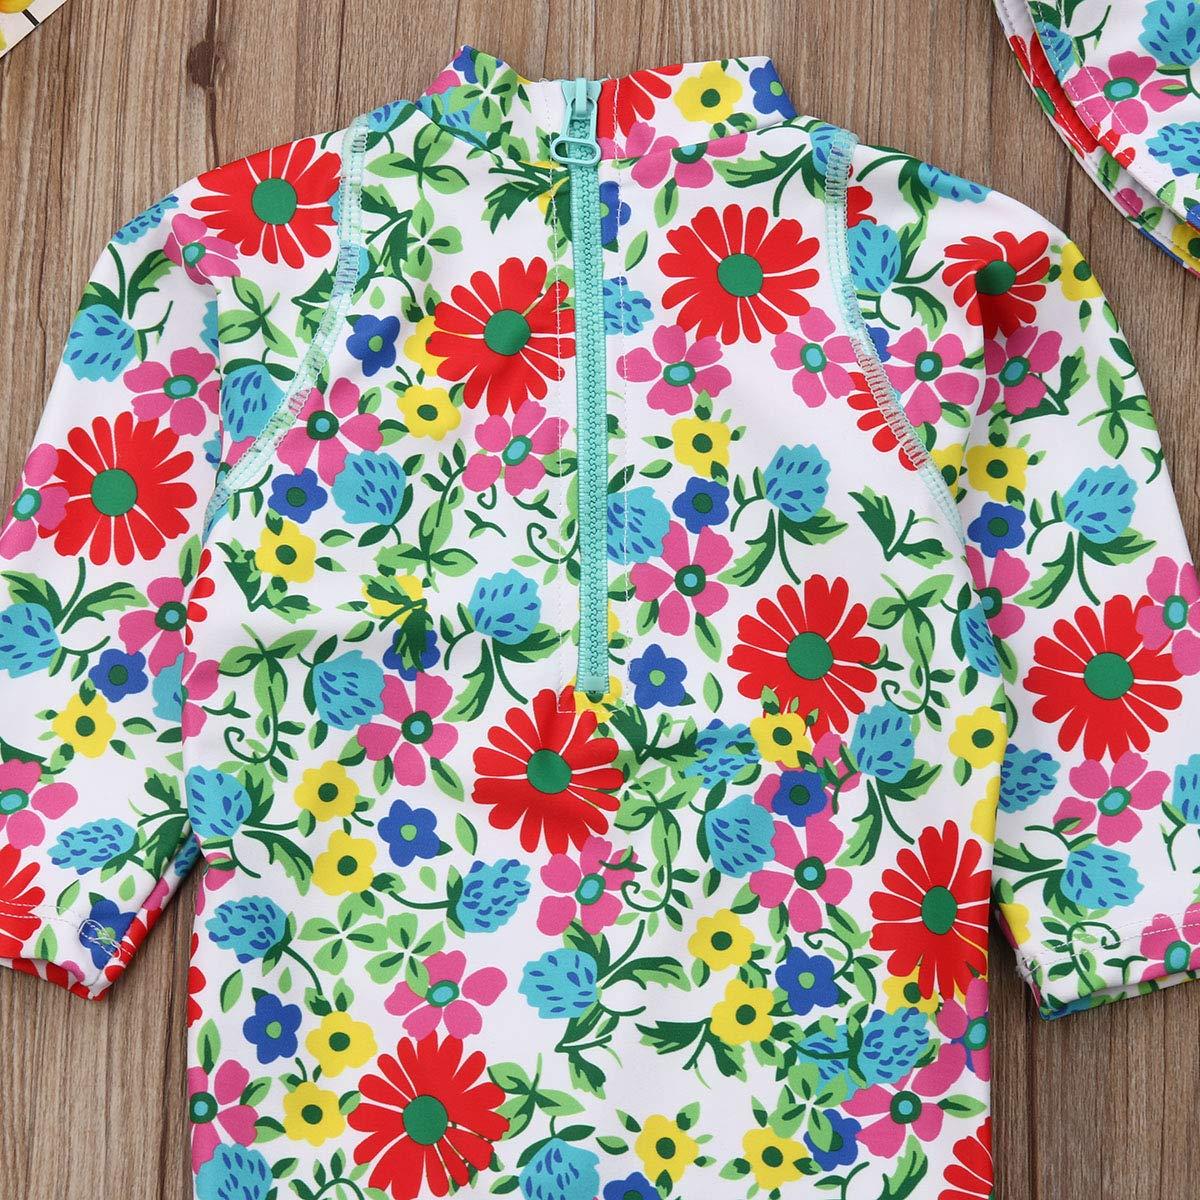 Douhoow Unisex Baby Boy Girl Rashguard T-Shirt Swimsuit Cover Up Sunsuit with Cap Hat